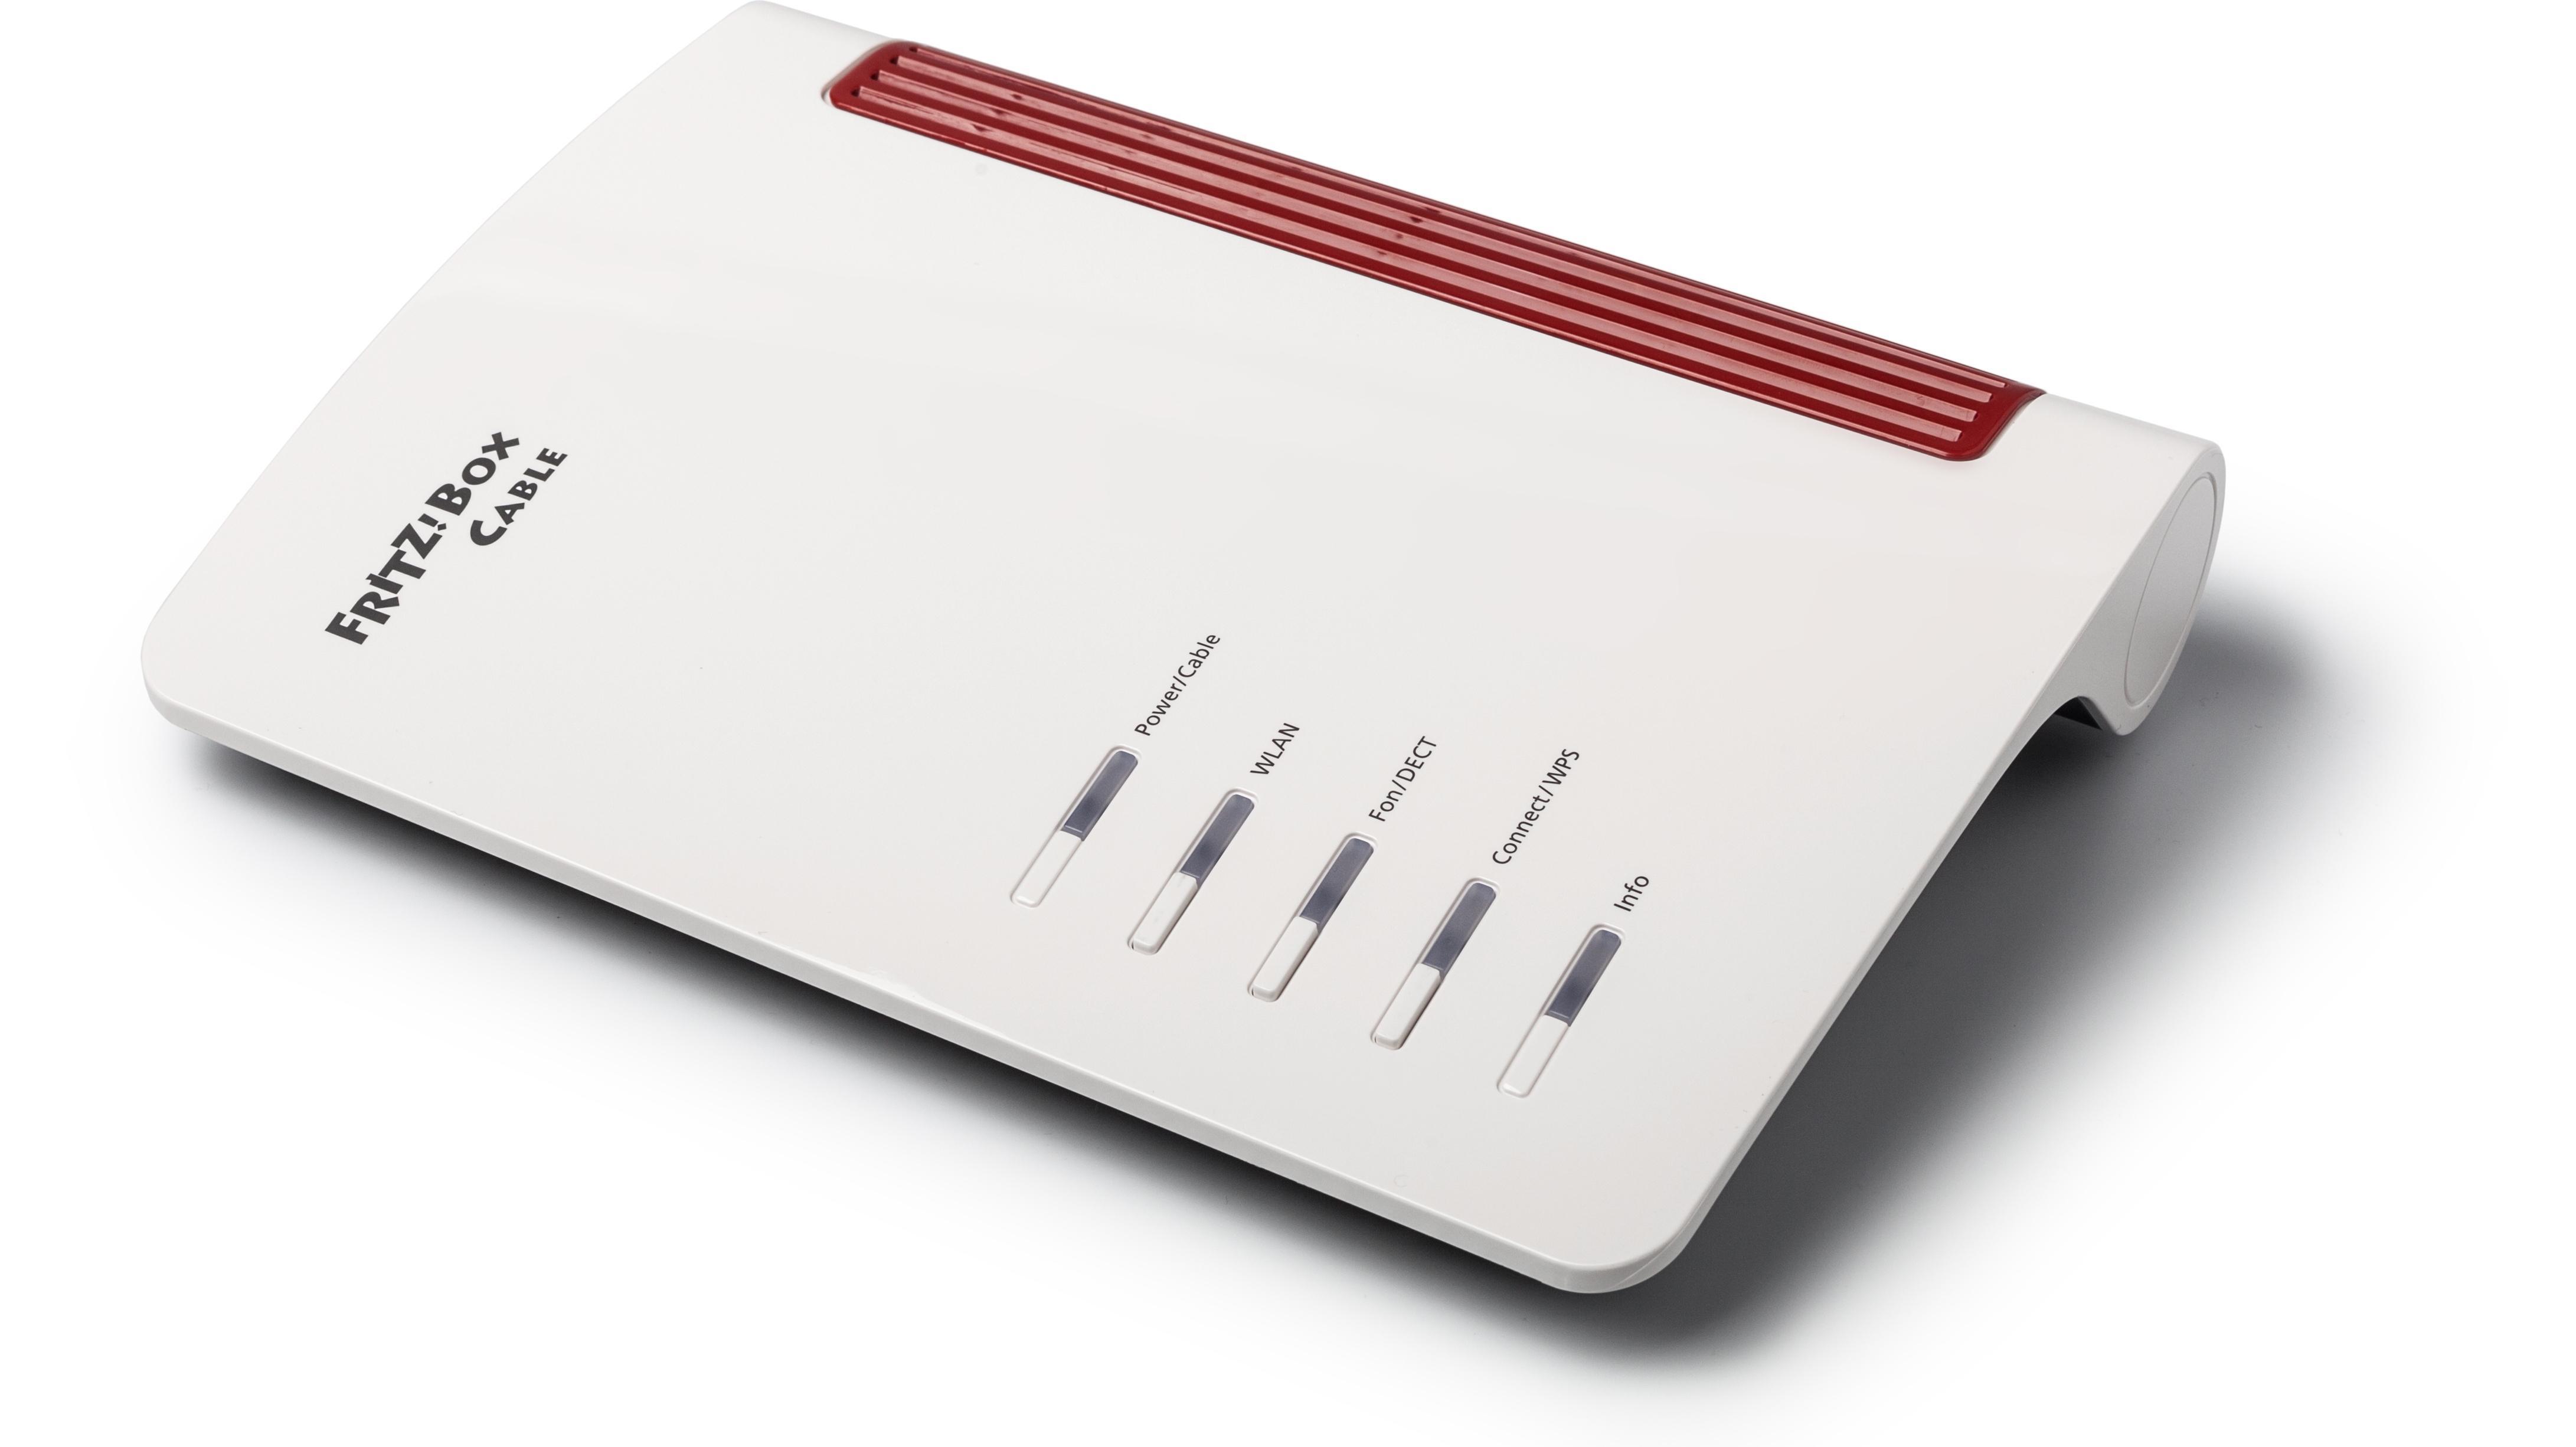 Fritzbox 20 AX AVMs erster DSL Router mit Wi Fi 20   WLAN mit ...